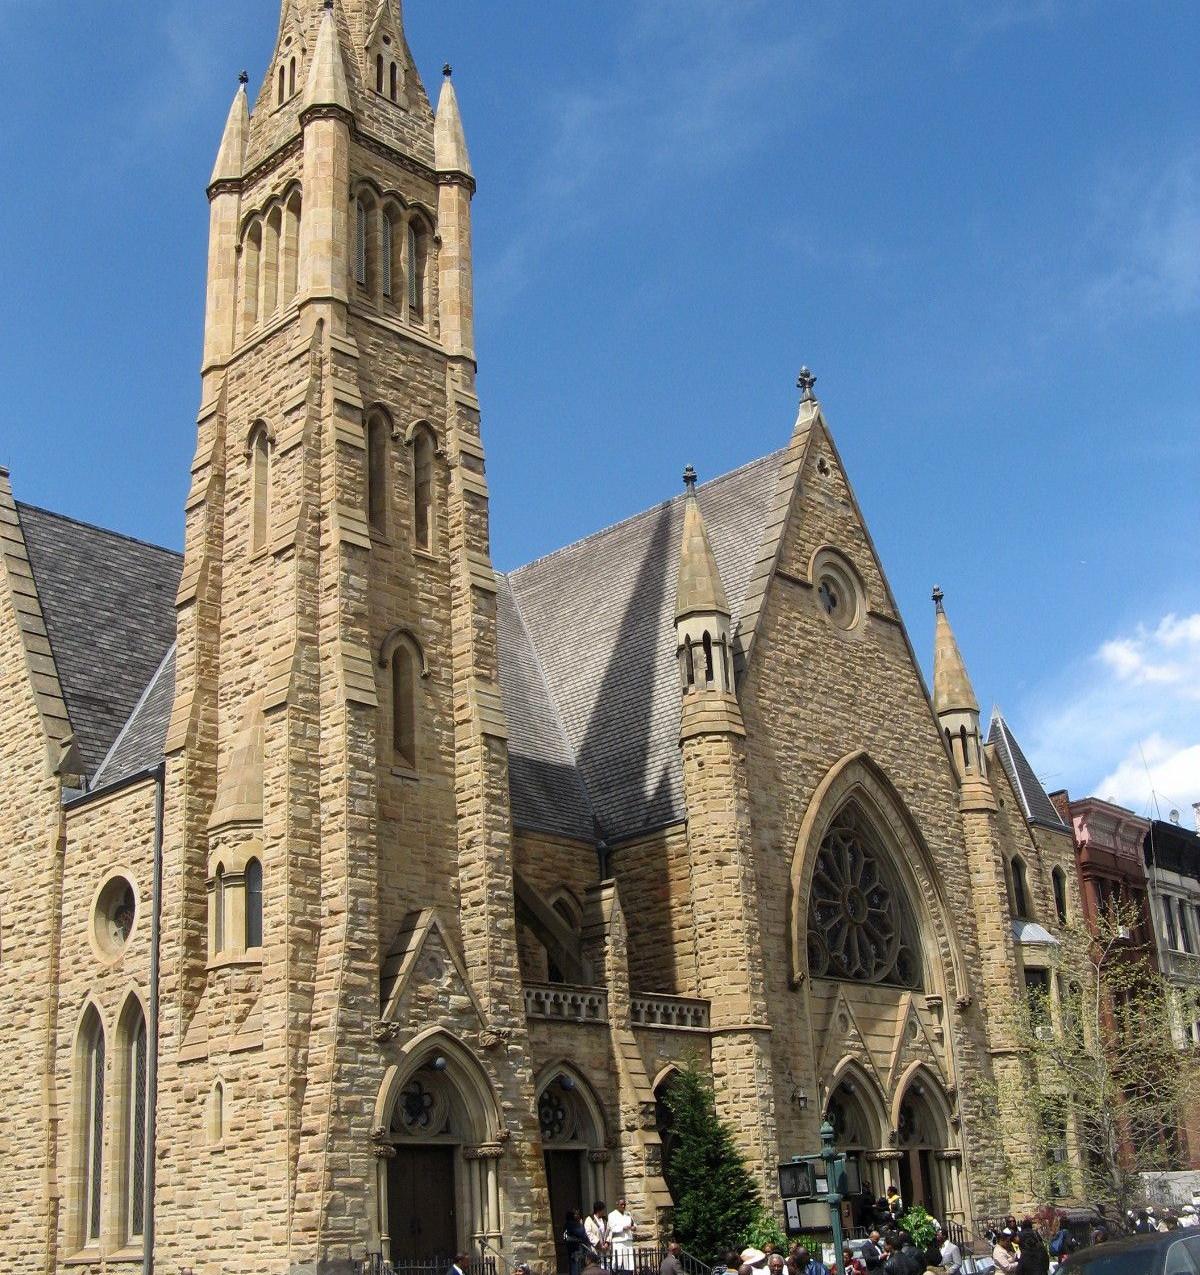 Epheses Seventh Day Adventist Church on